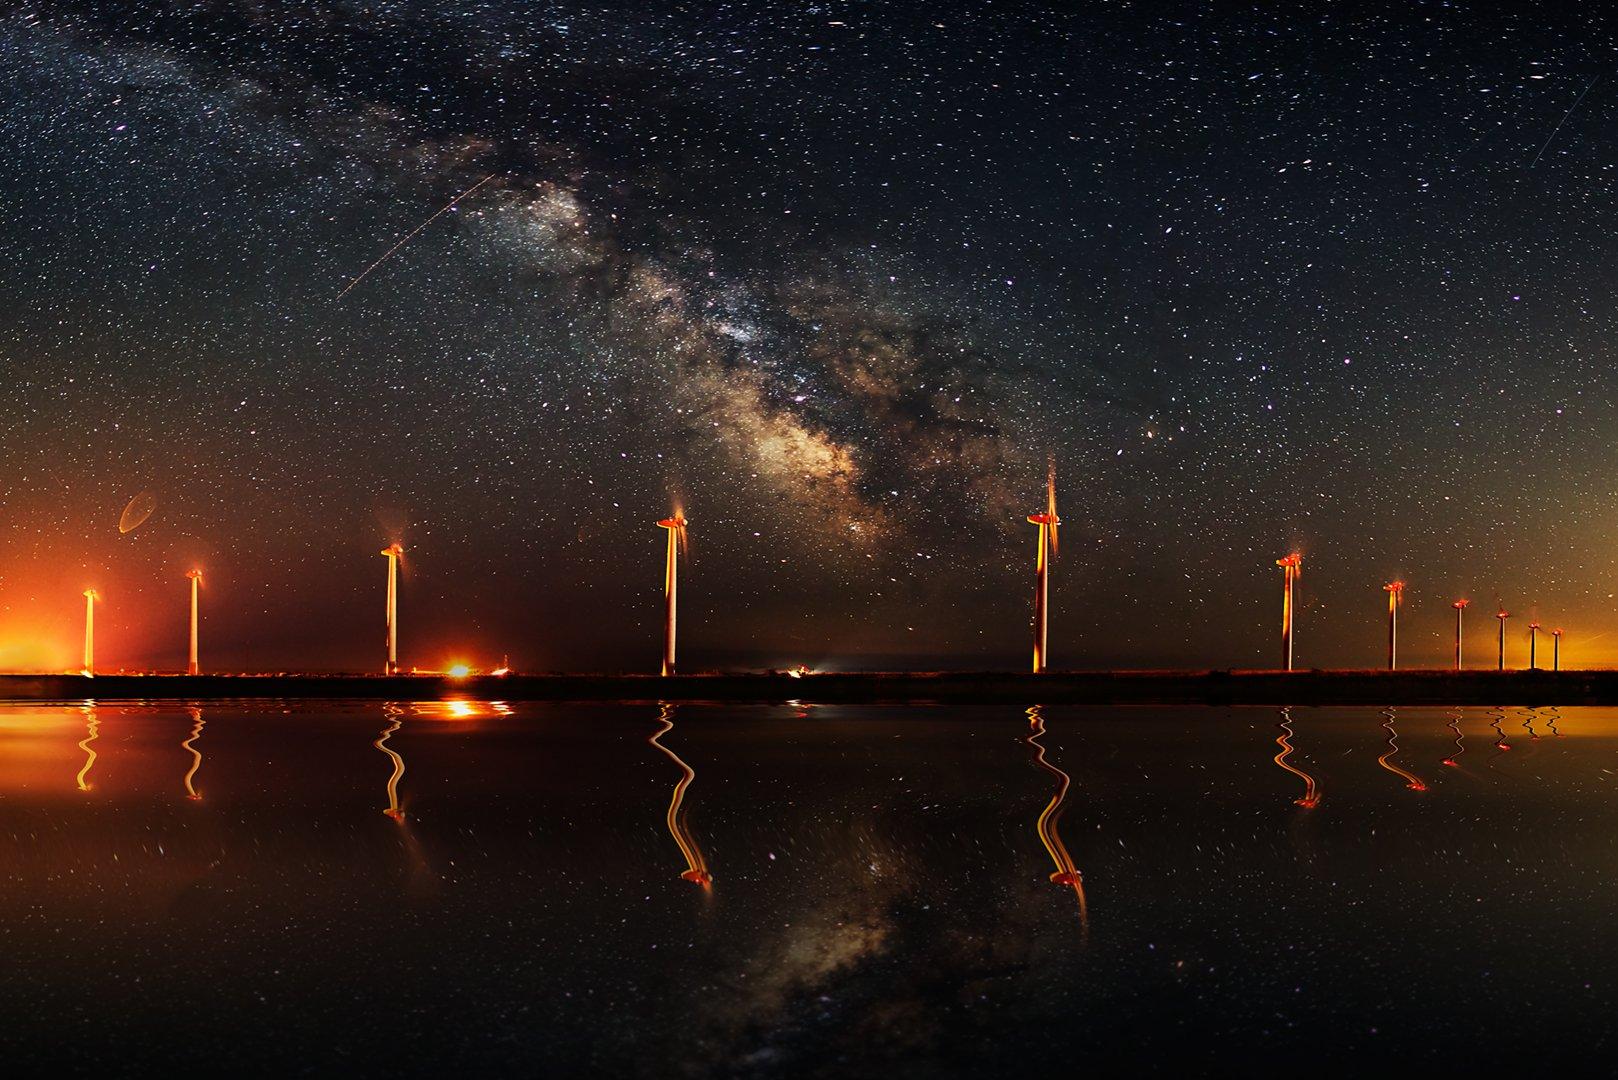 landscape, milky way, stars, long exposure, panorama, night, reflection, canon, Bulgaria, Todor Todorov